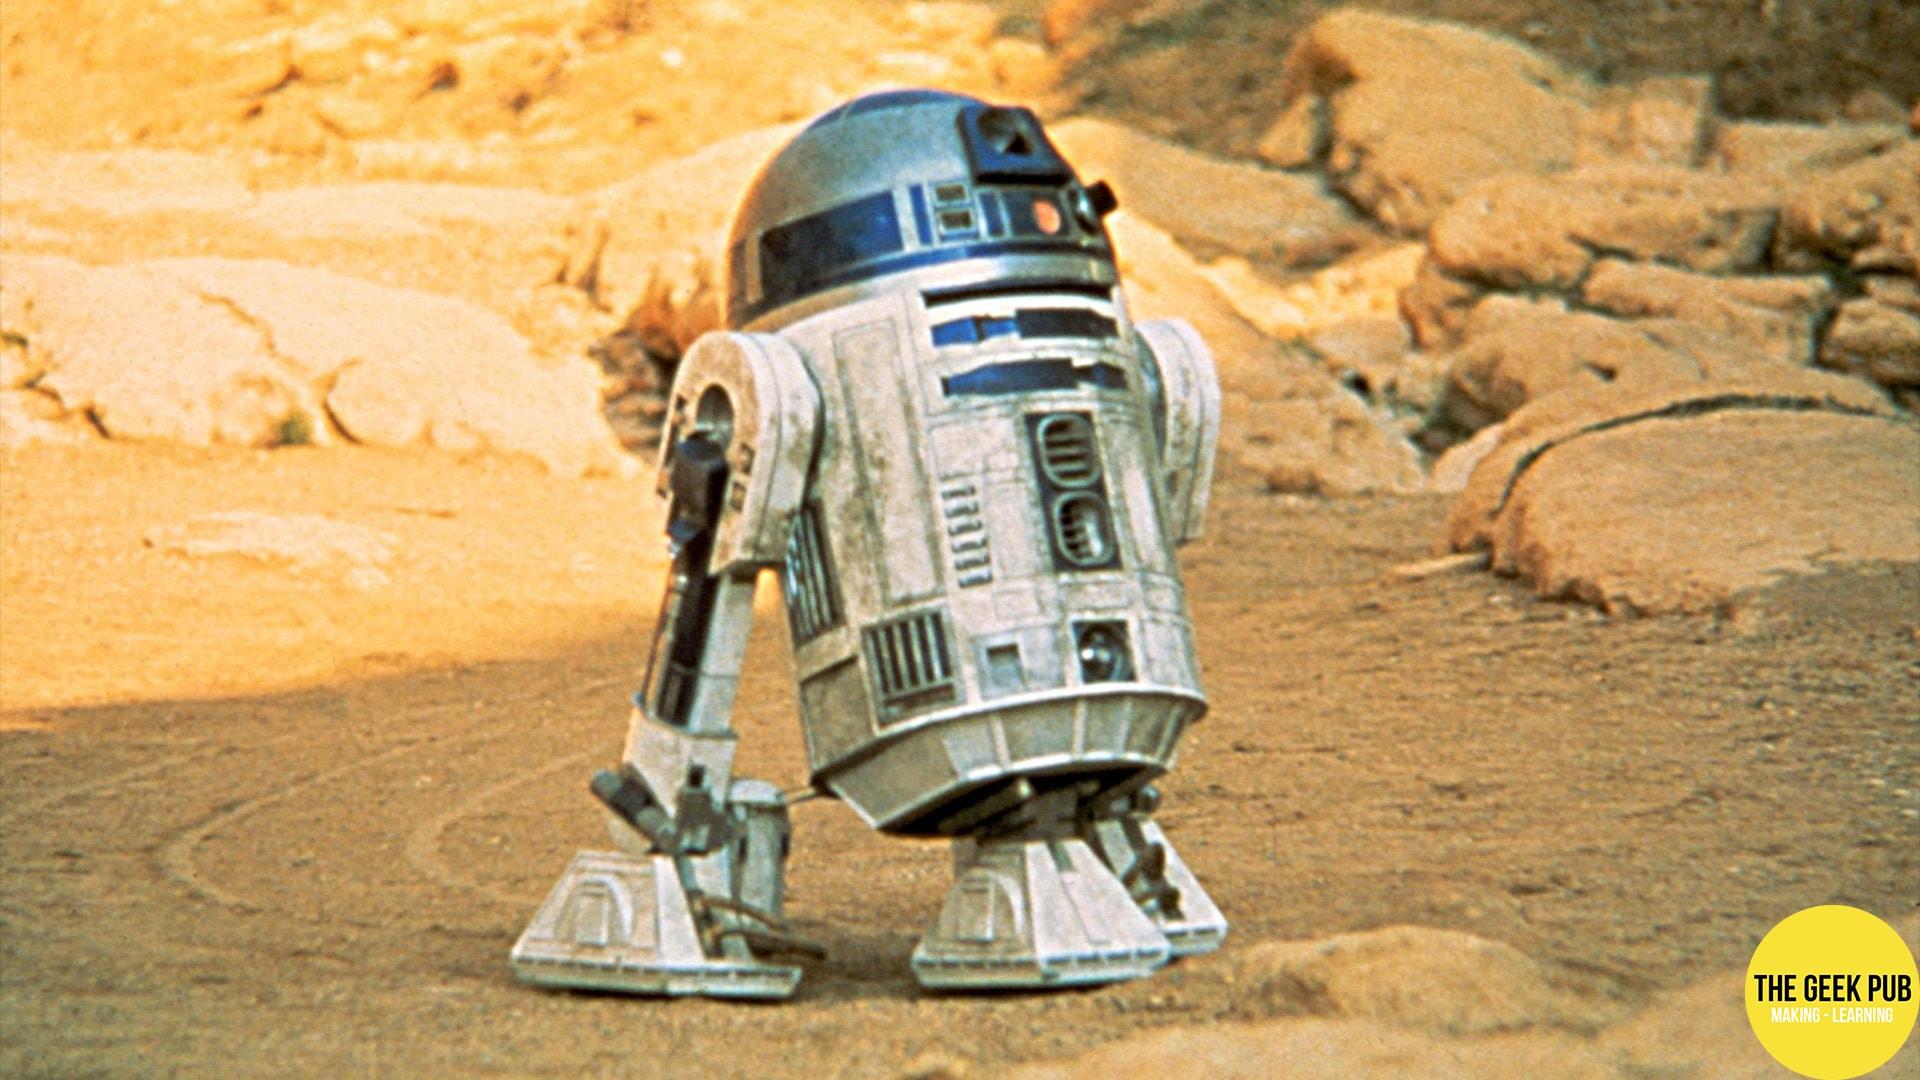 1) Star Wars (1977)